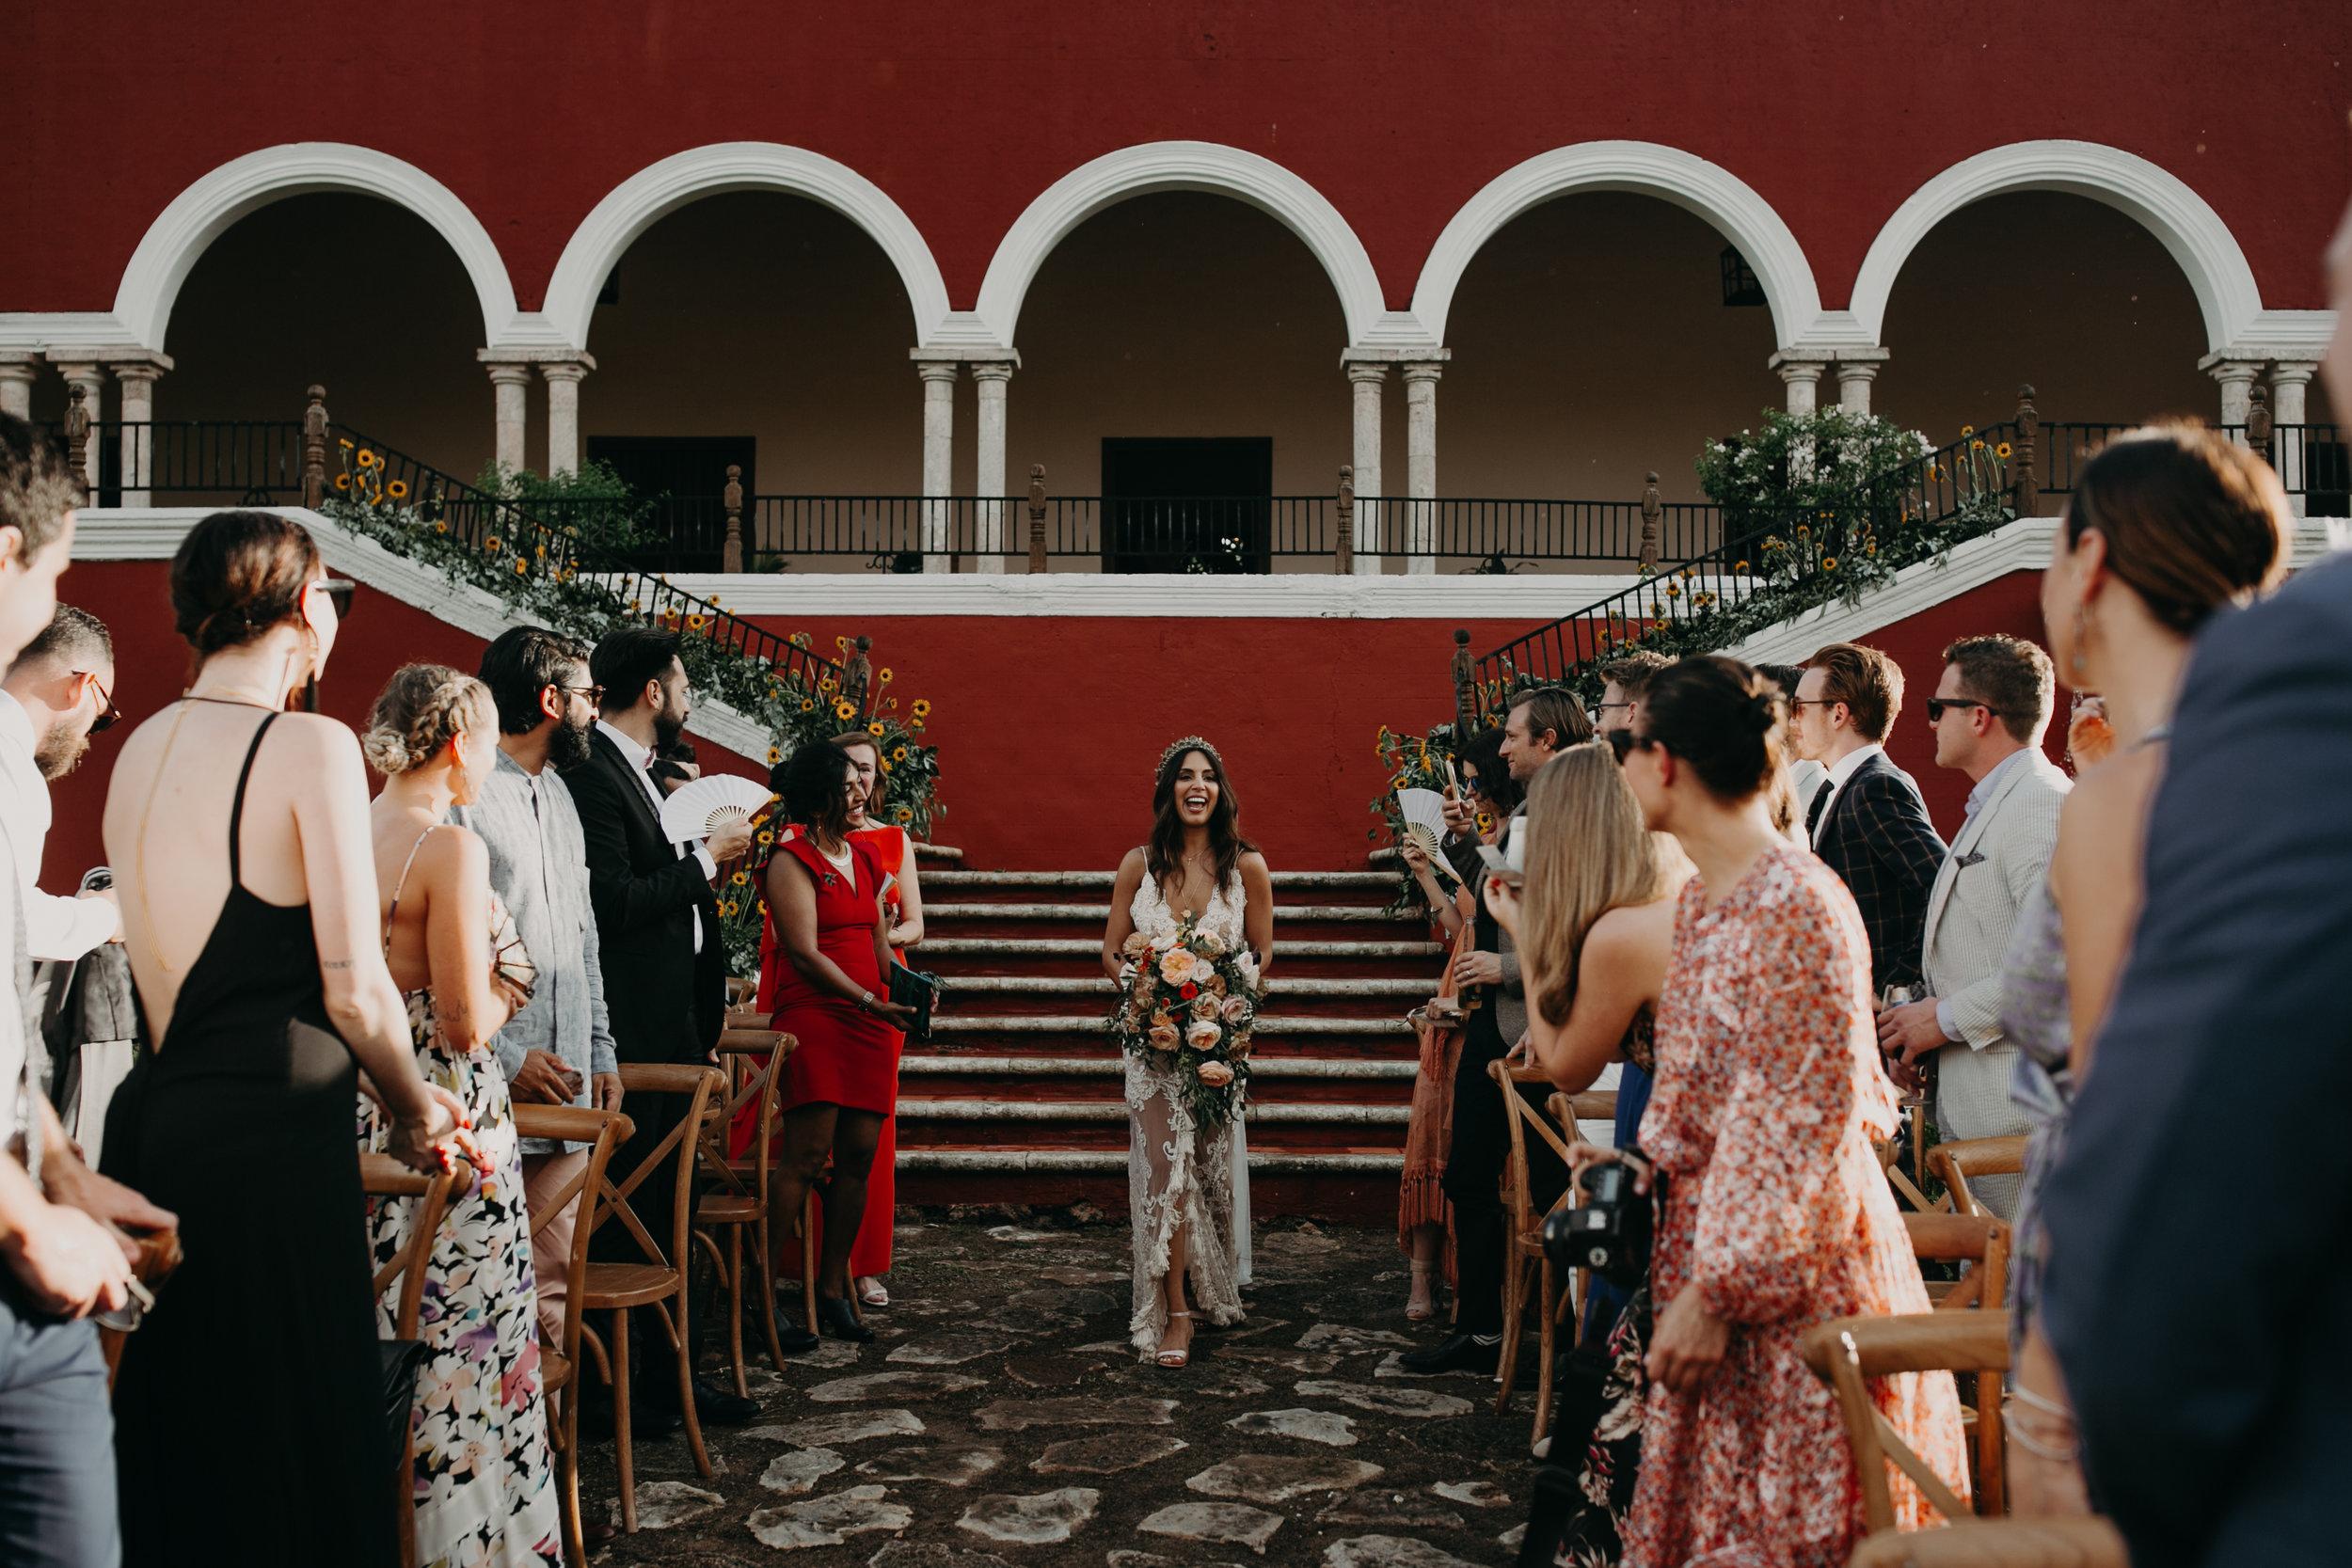 Hacienda Temozon Yucatan Mexico Wedding | Ida & Peter Emily Magers Photography-977.jpg